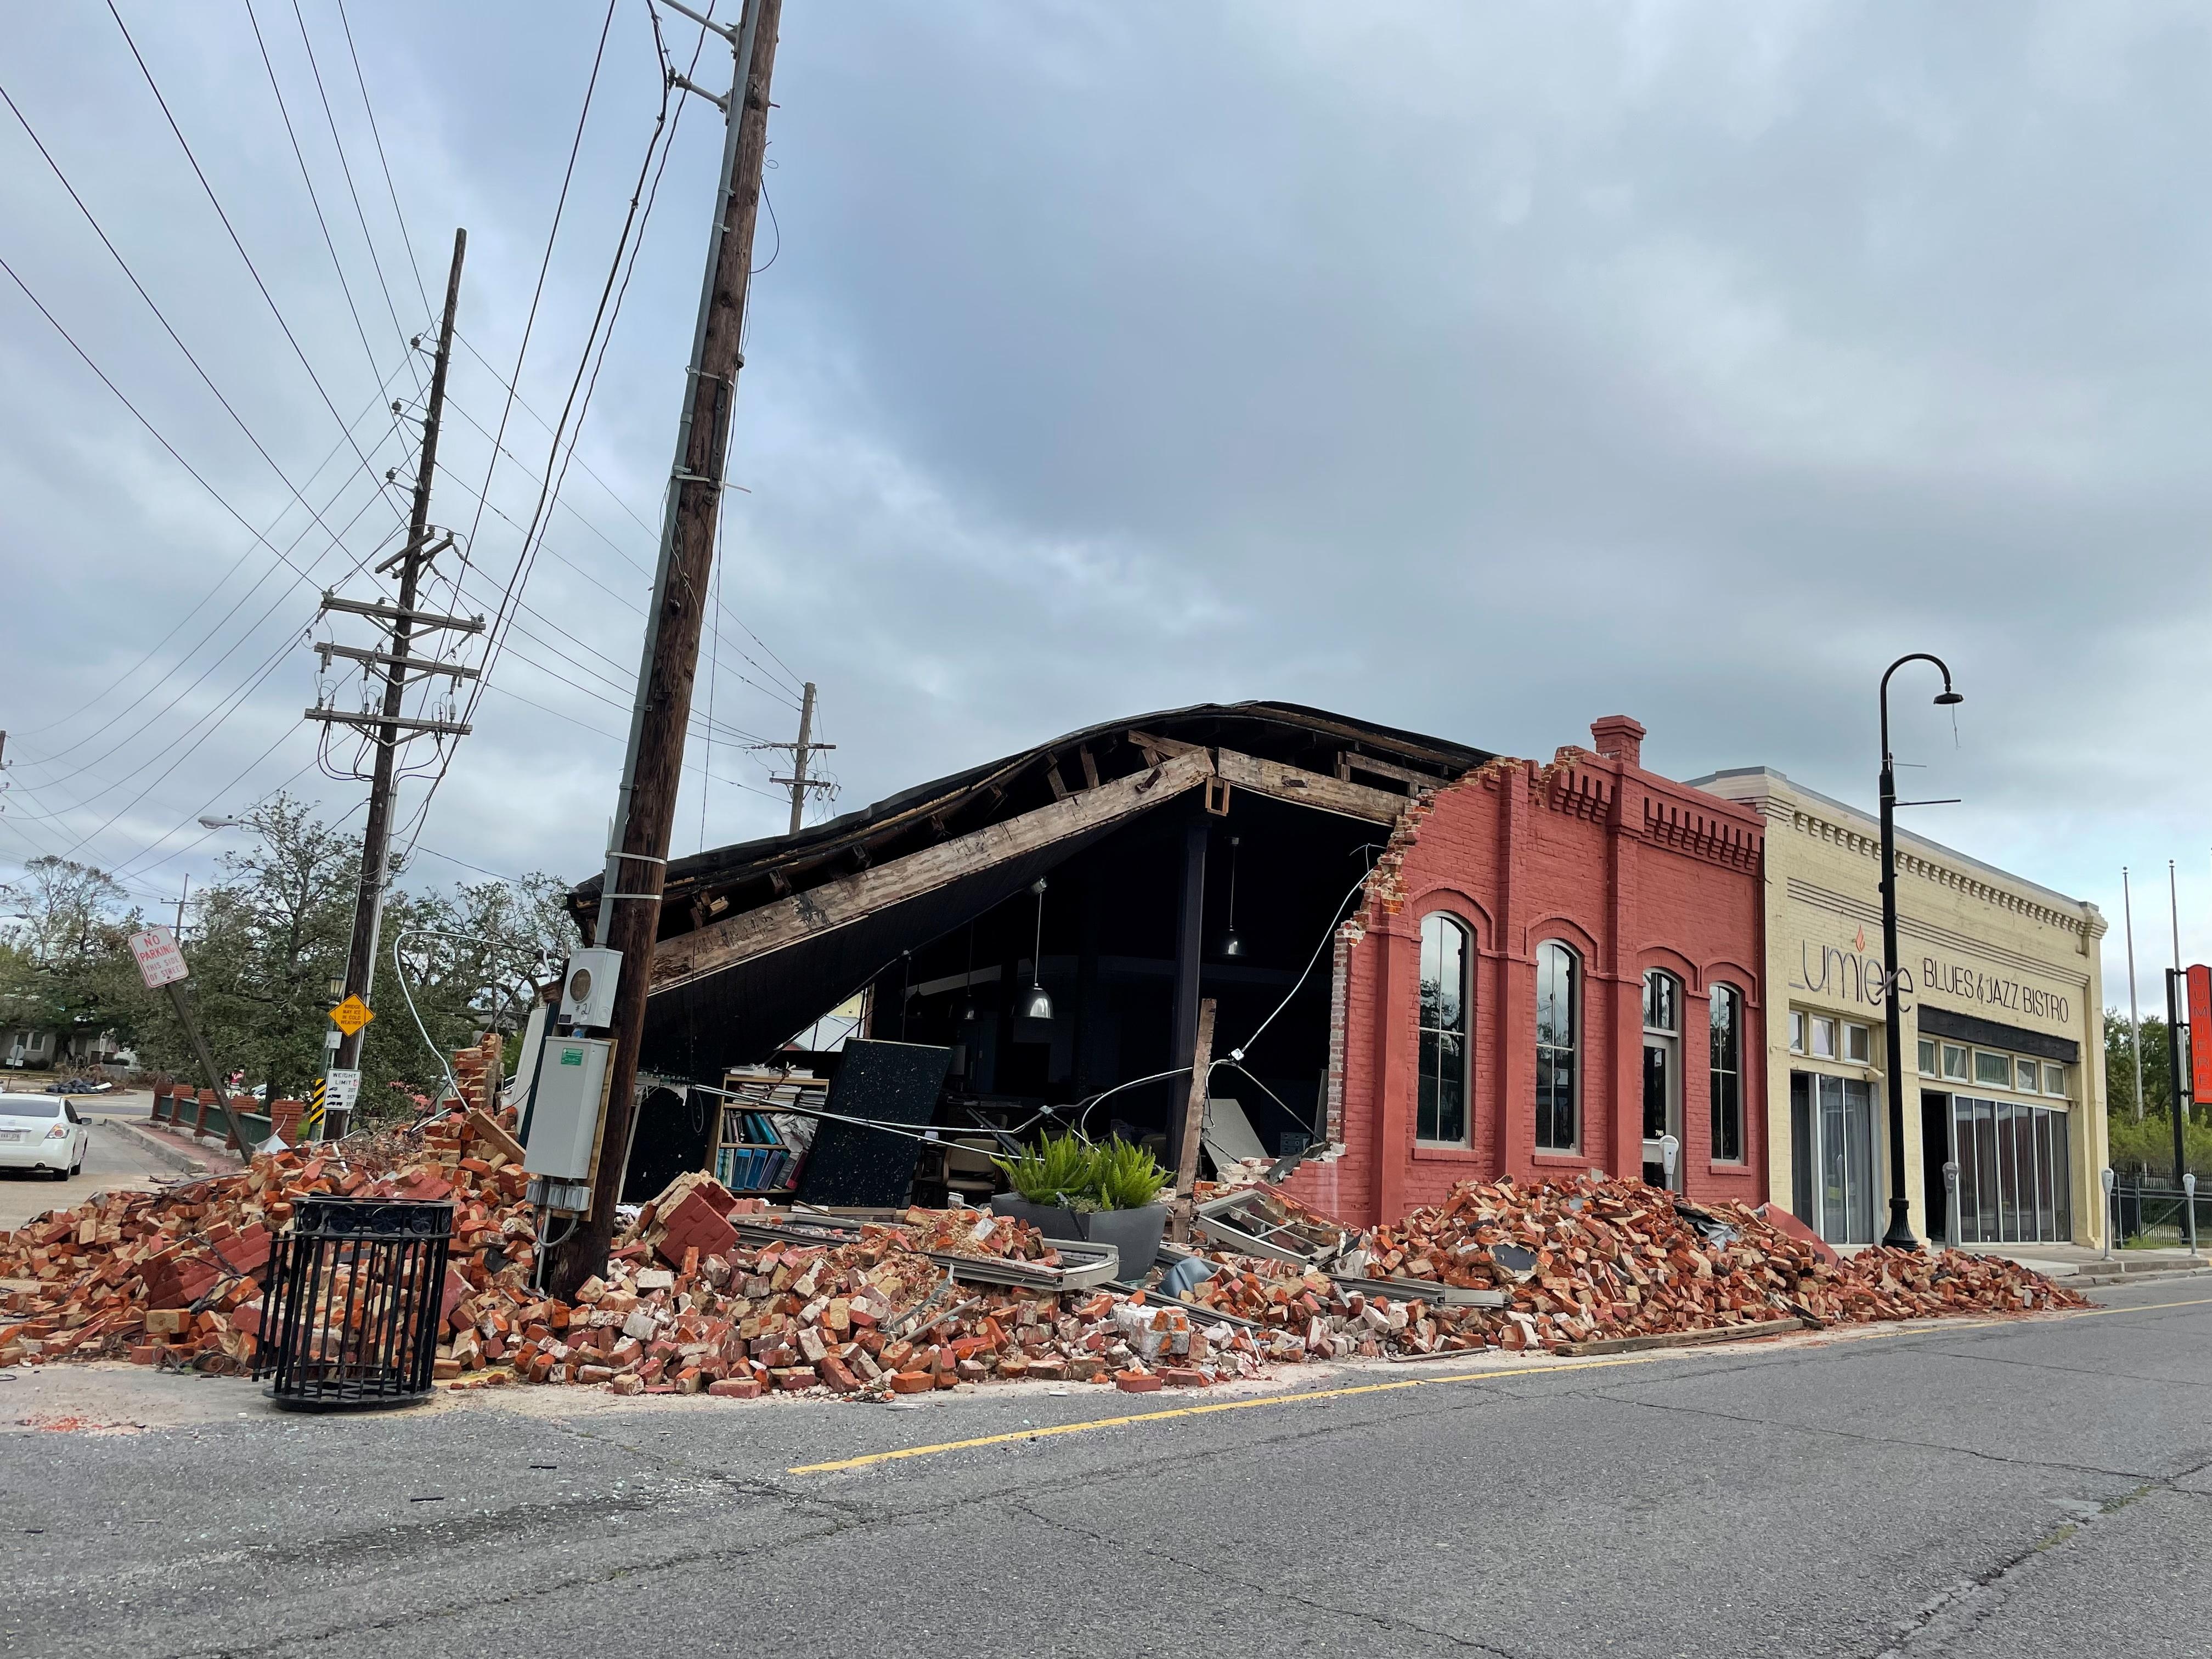 A damaged building is seen in downtown Houma following Hurricane Ida, Louisiana, U.S., September 22, 2021. Picture taken September 22, 2021. REUTERS/Liz Hampton